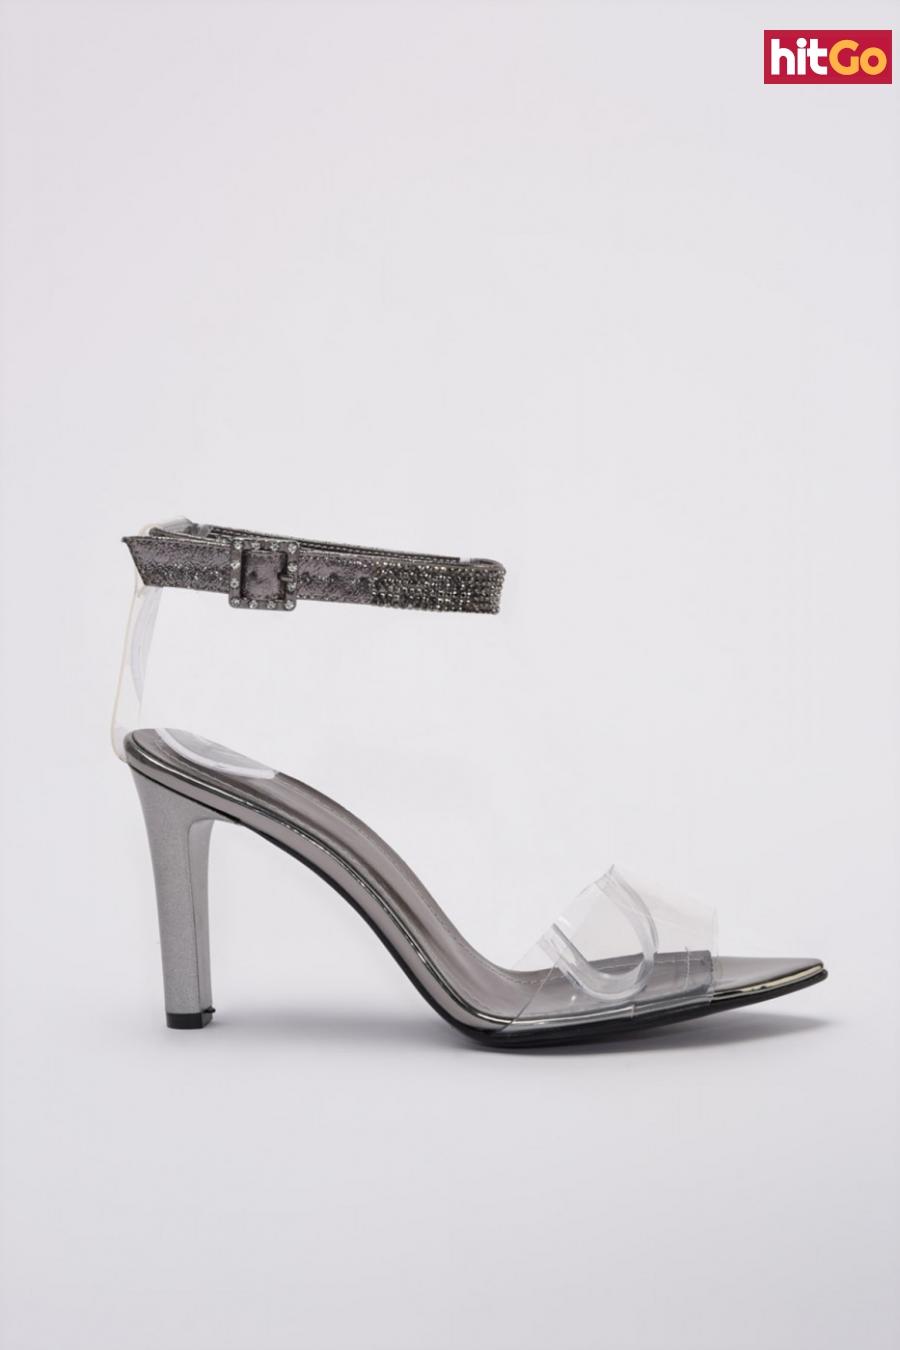 Trendyol Anthracite Stone Detailed Transparent Womens Classic Heels dámské 40